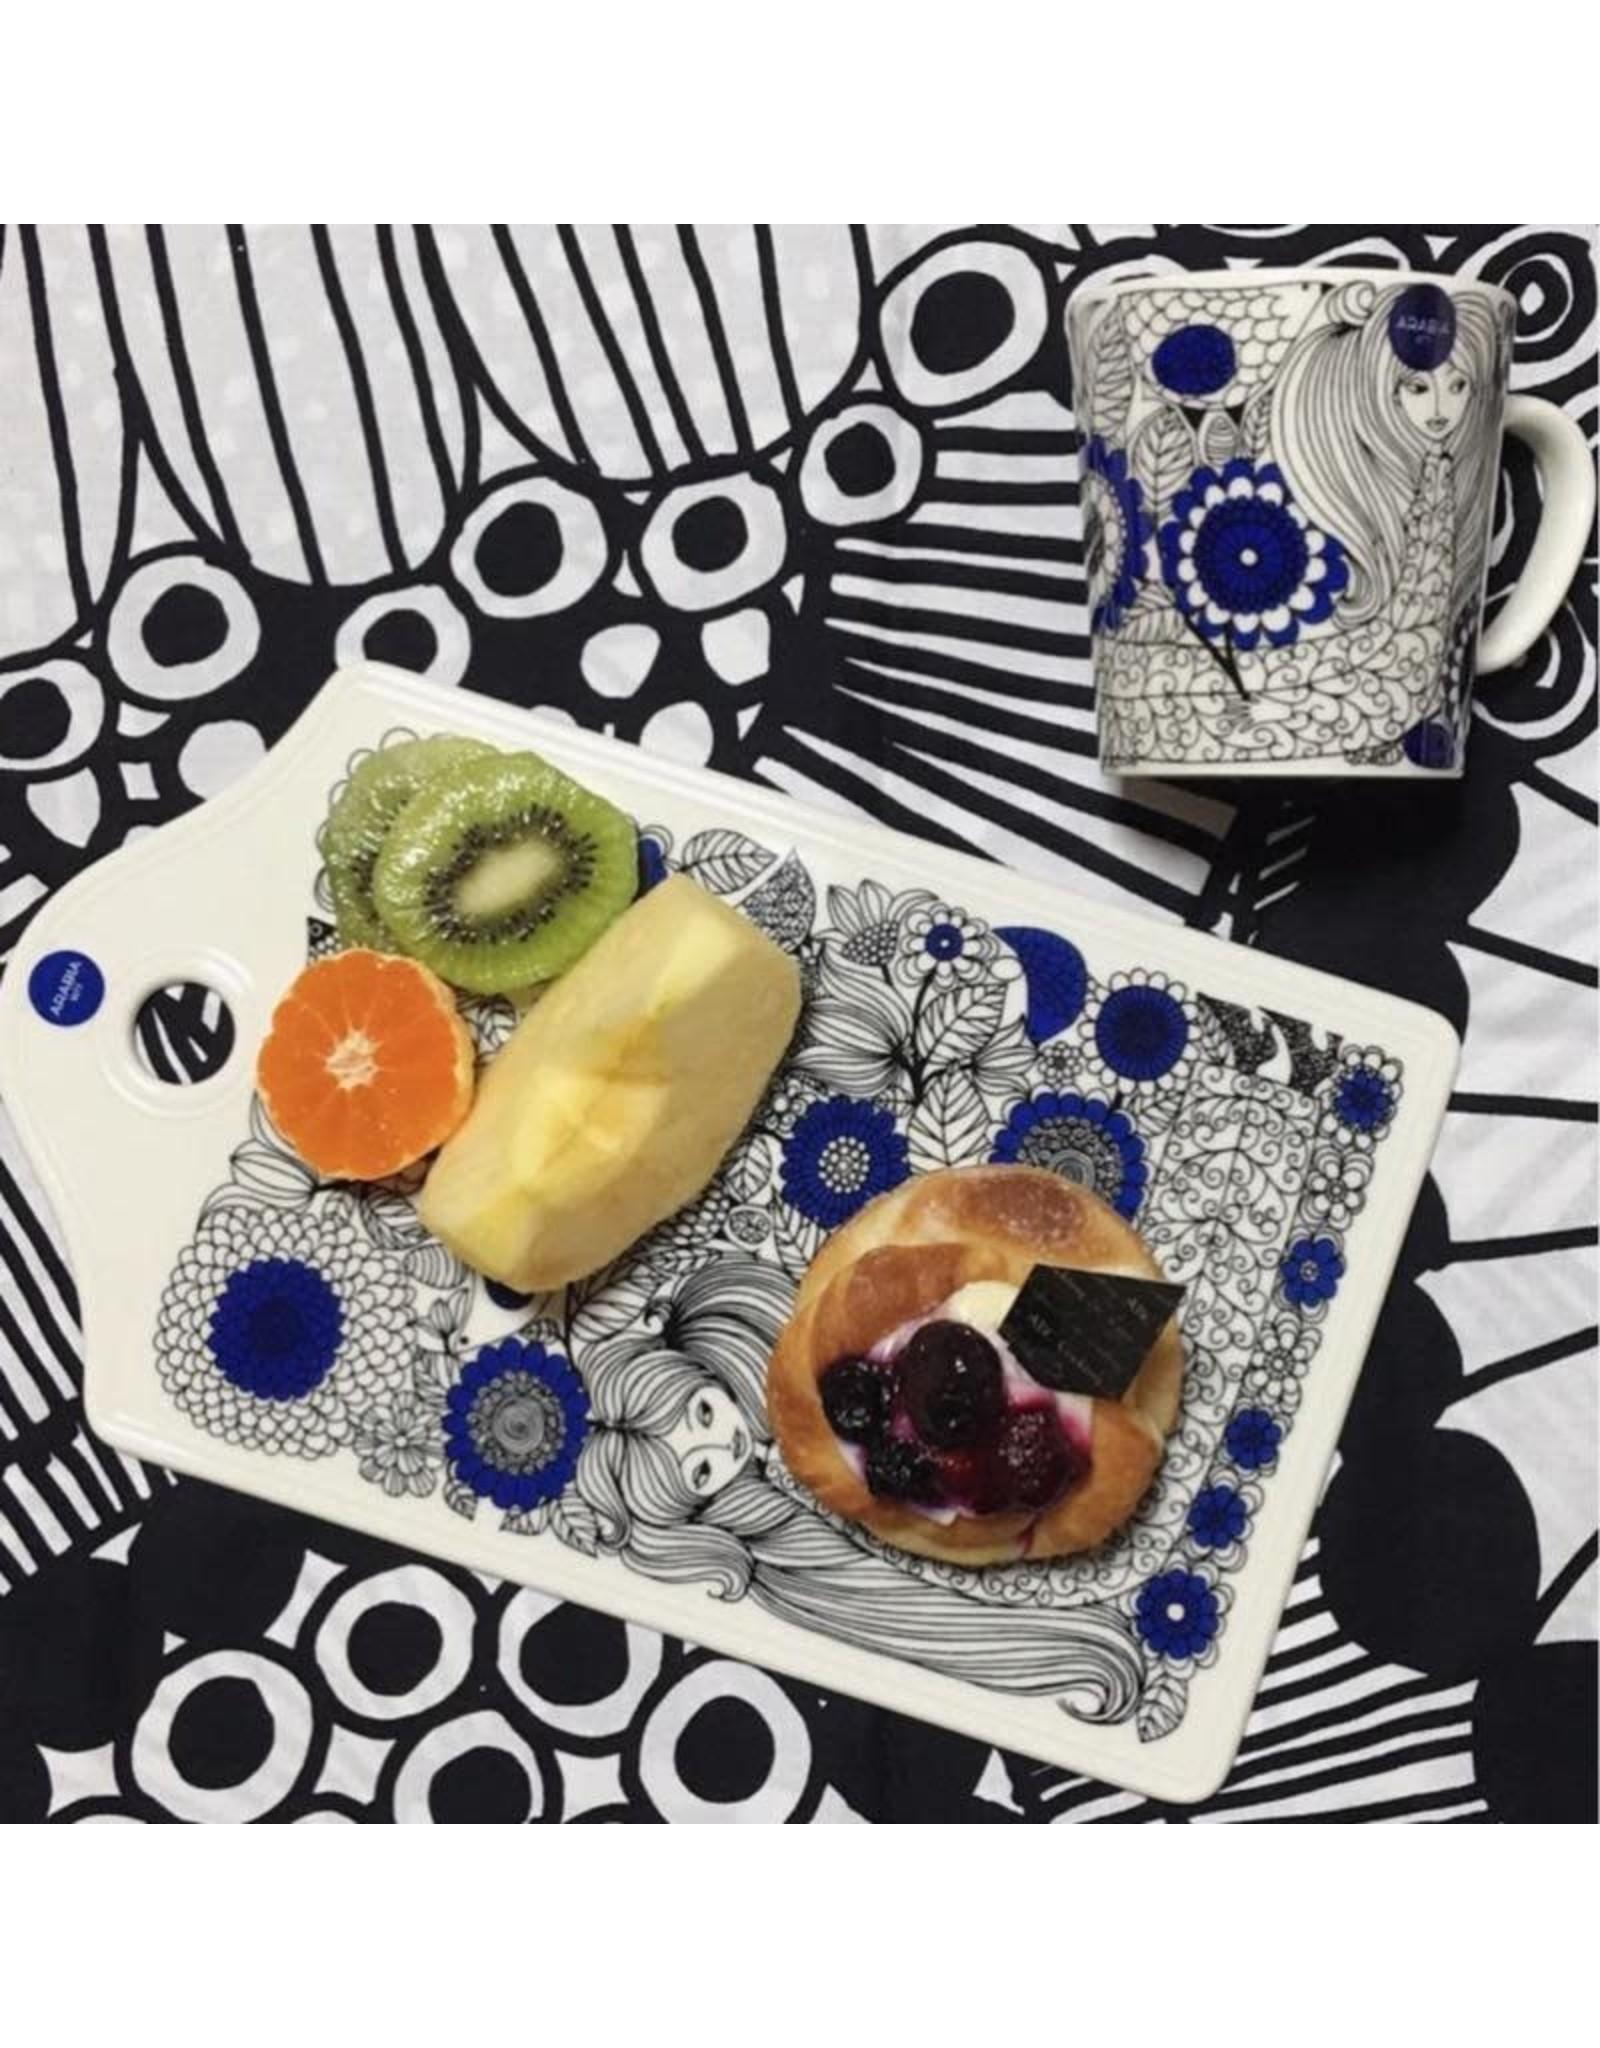 ARABIA PASTORAALI 系列餐具